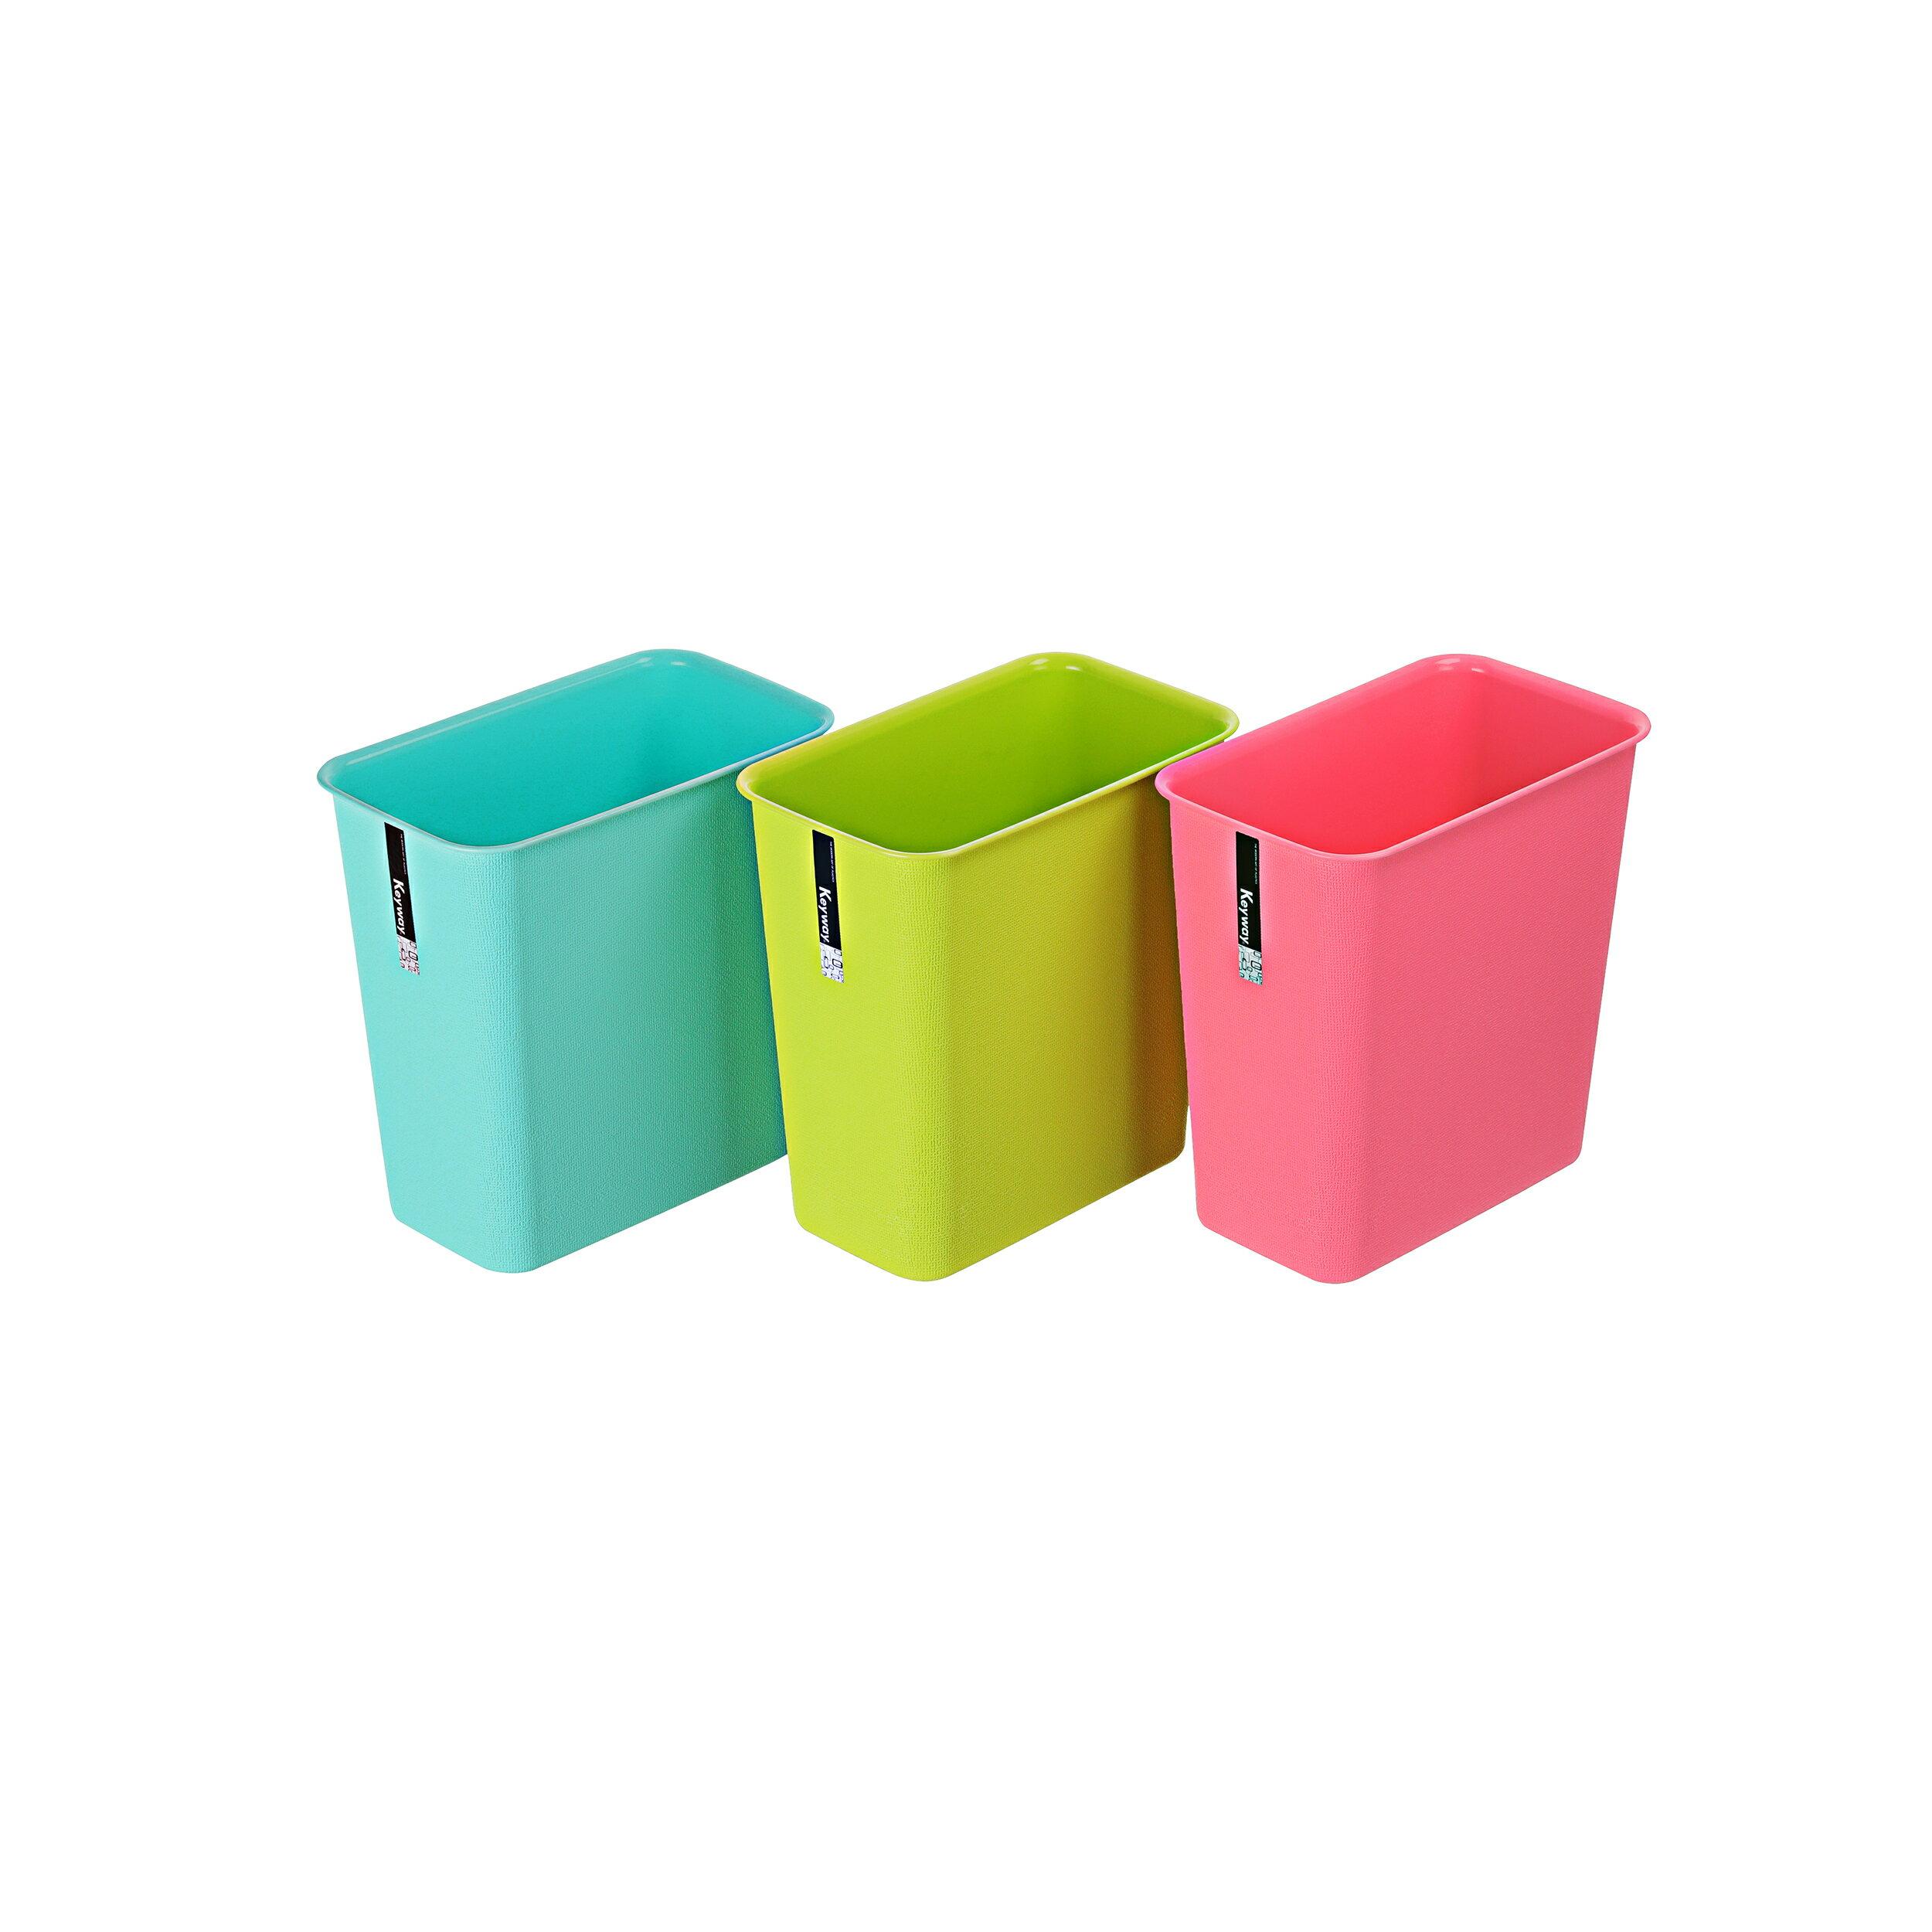 KEYWAY聯府 MIT 小彩虹垃圾桶(長型)C9303(顏色隨機出貨) 0